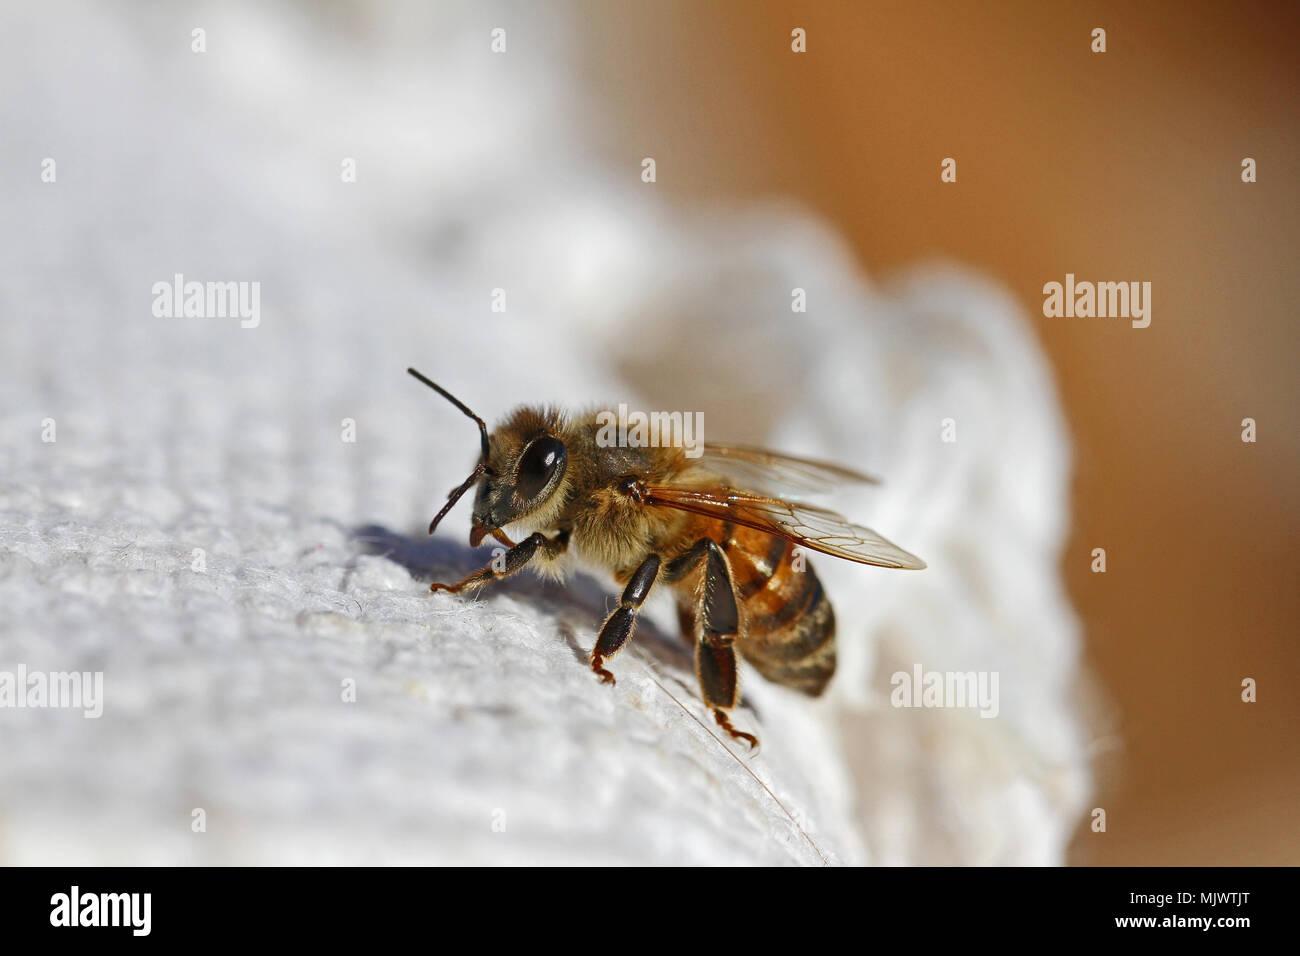 Miel de abeja obrera abeja o un primerísimo plano América Apis mellifera arrastrándose sobre un paño blanco en Italia en primavera Foto de stock